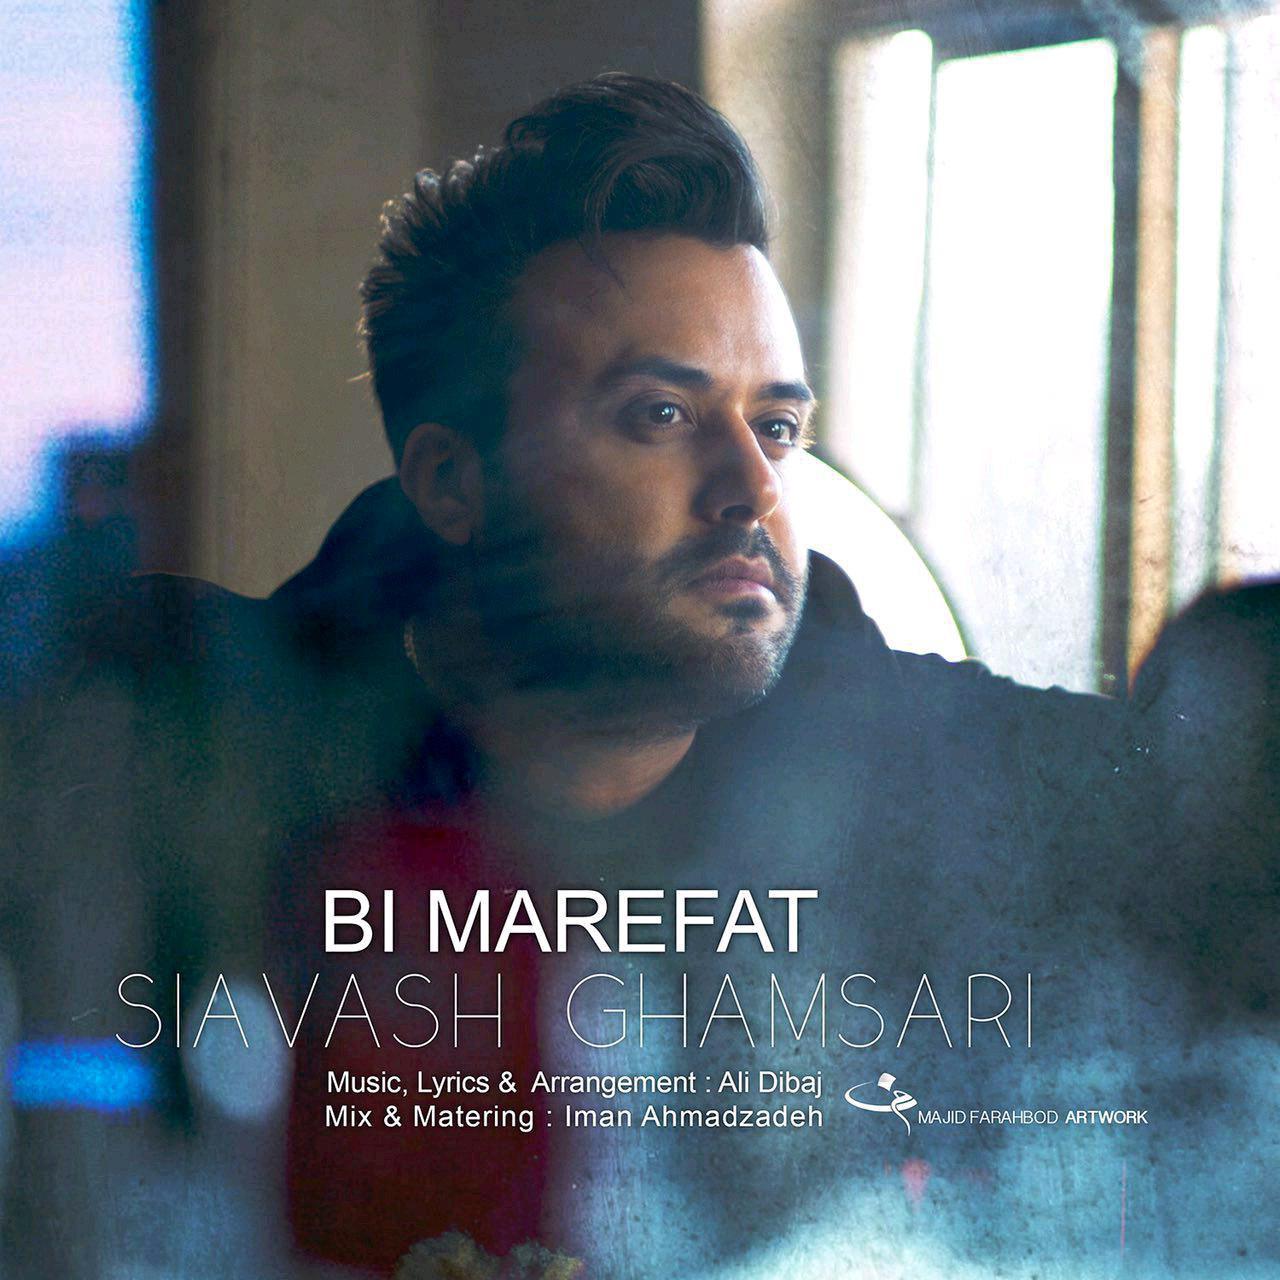 Siavash Ghamsari – Bimarefat